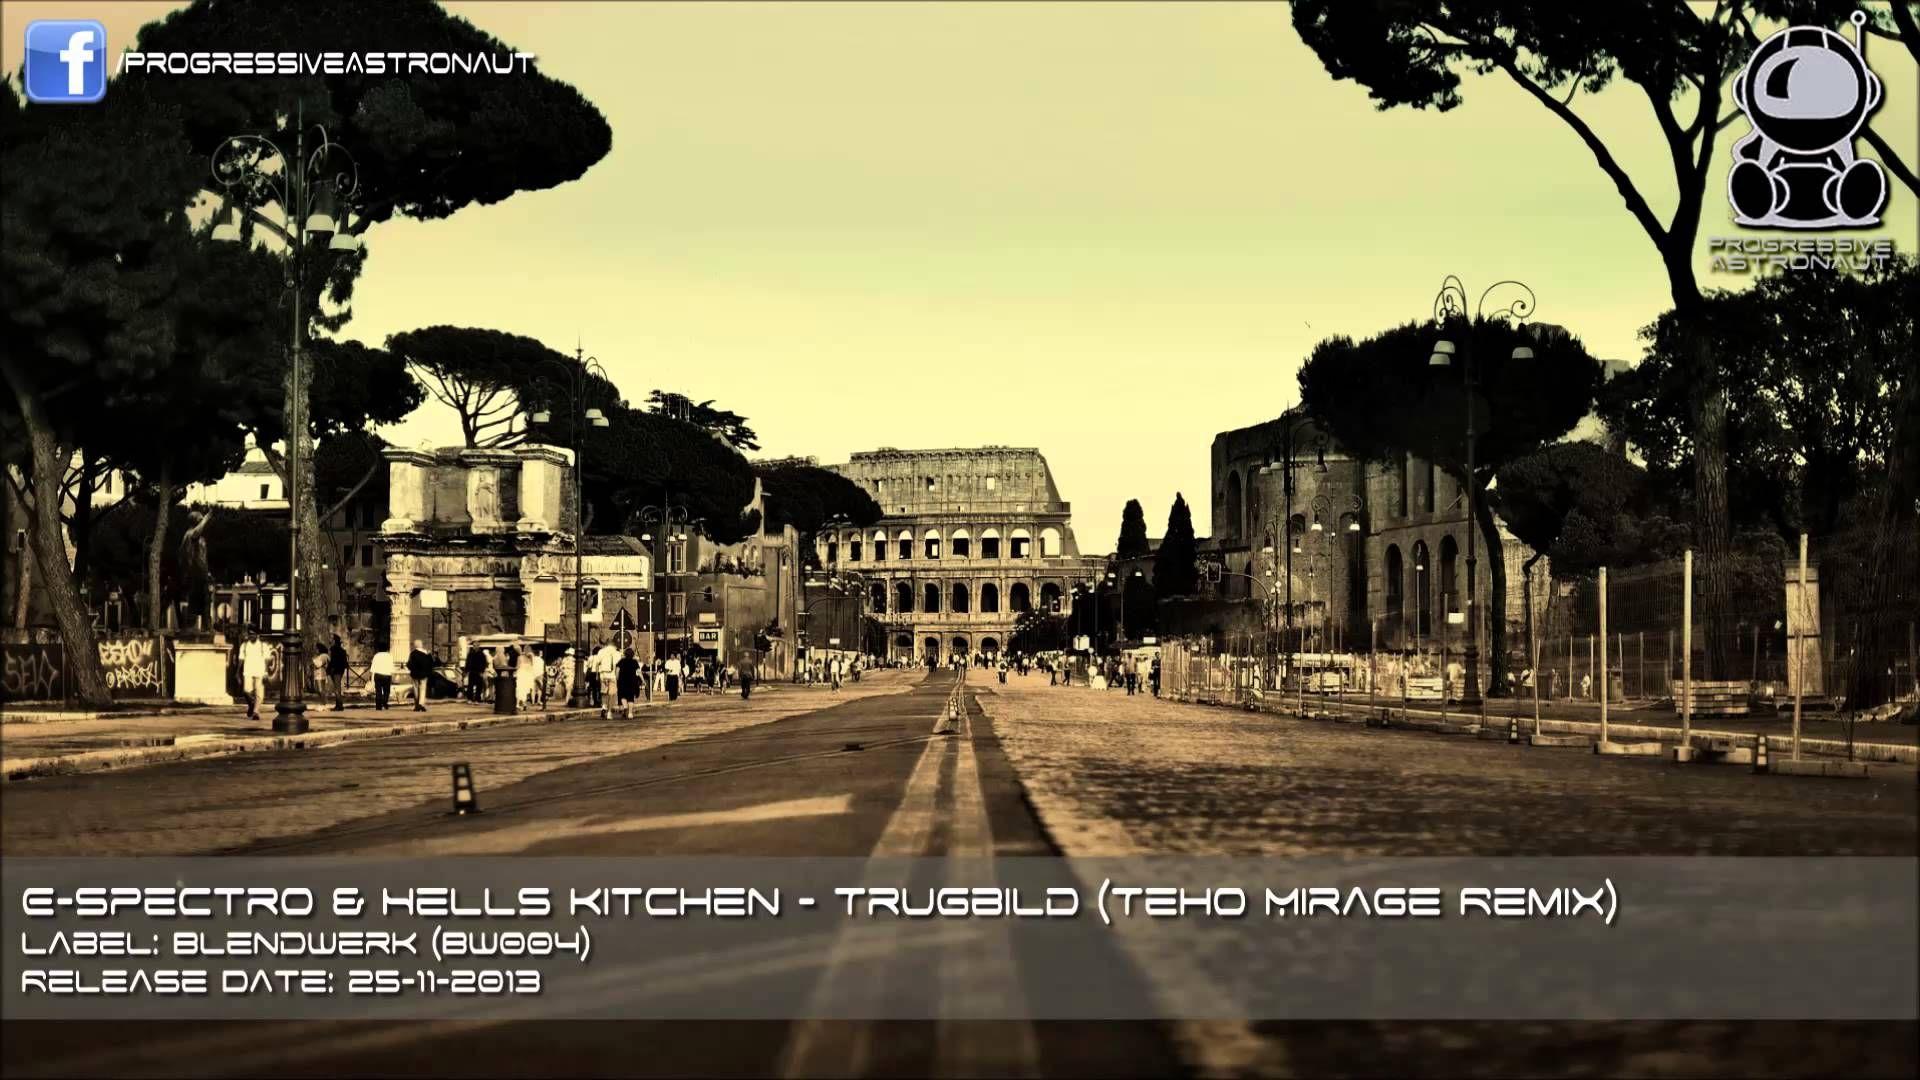 E-Spectro & Hells Kitchen - Trugbild (Teho Mirage Remix)